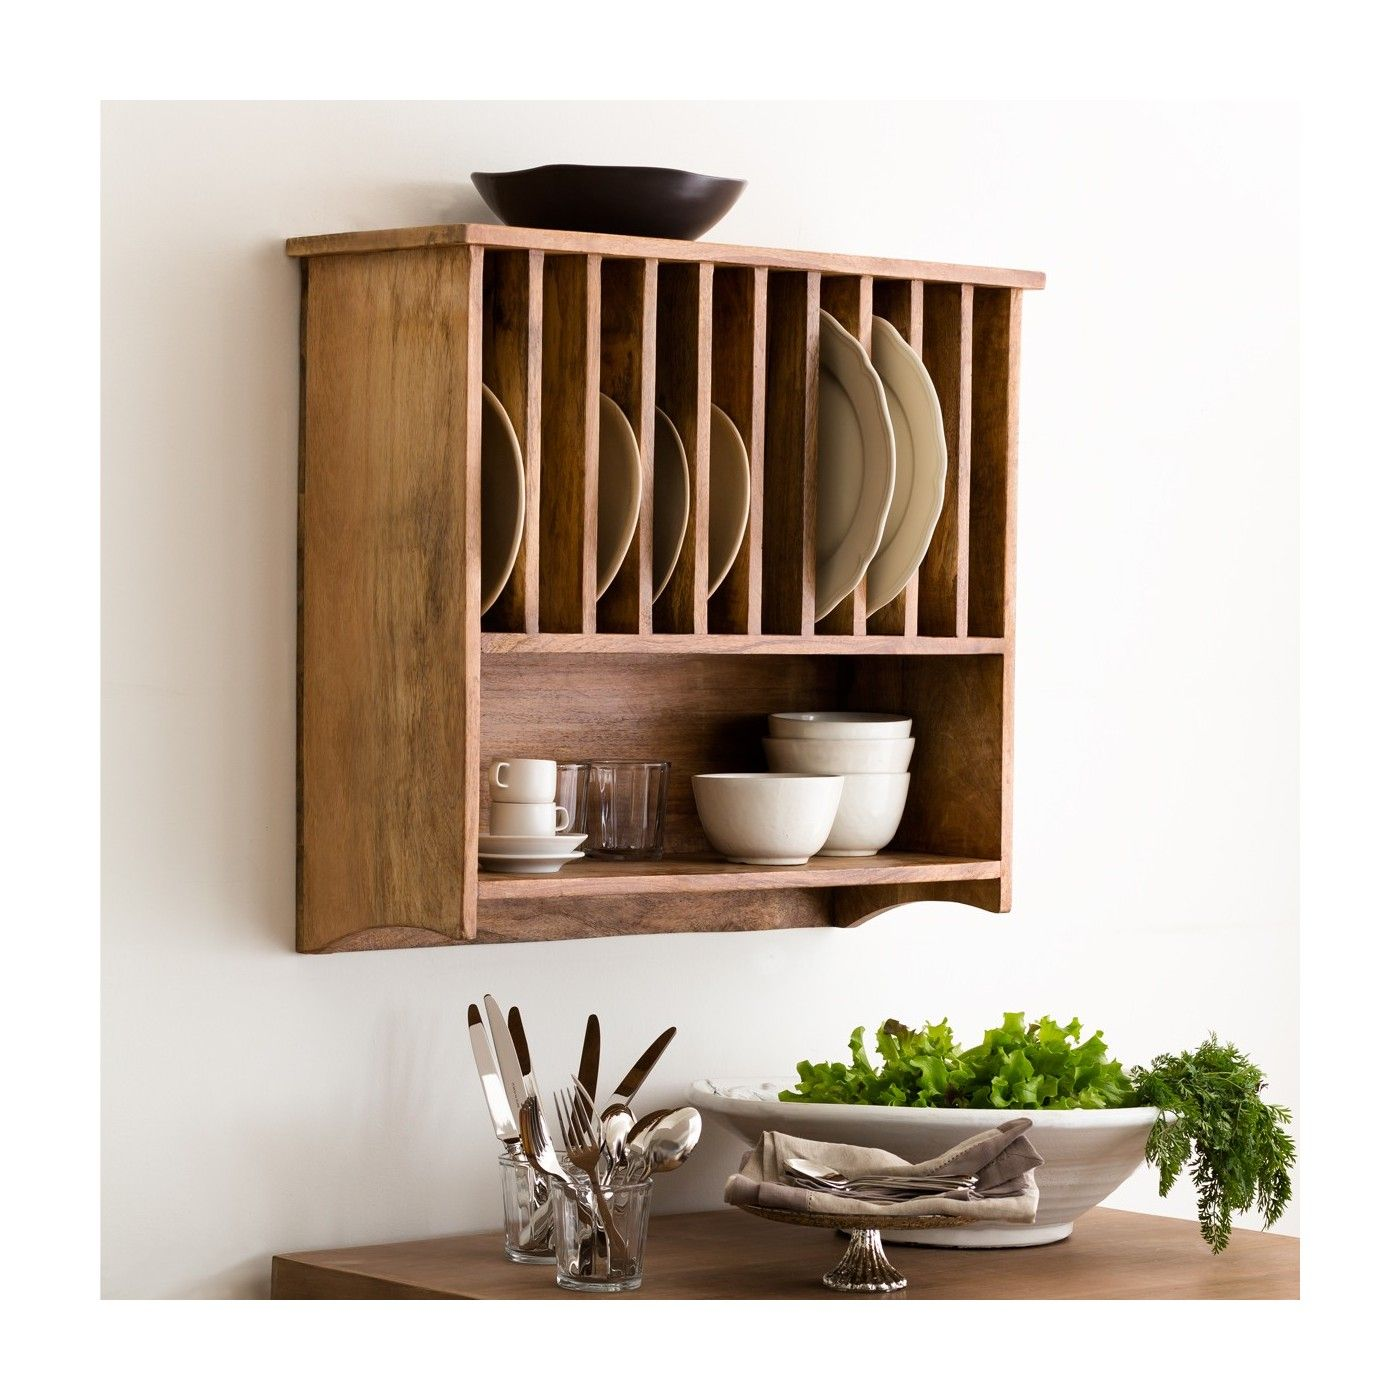 Wall Mounted Plate Shelves Photo 10 Rack Wooden